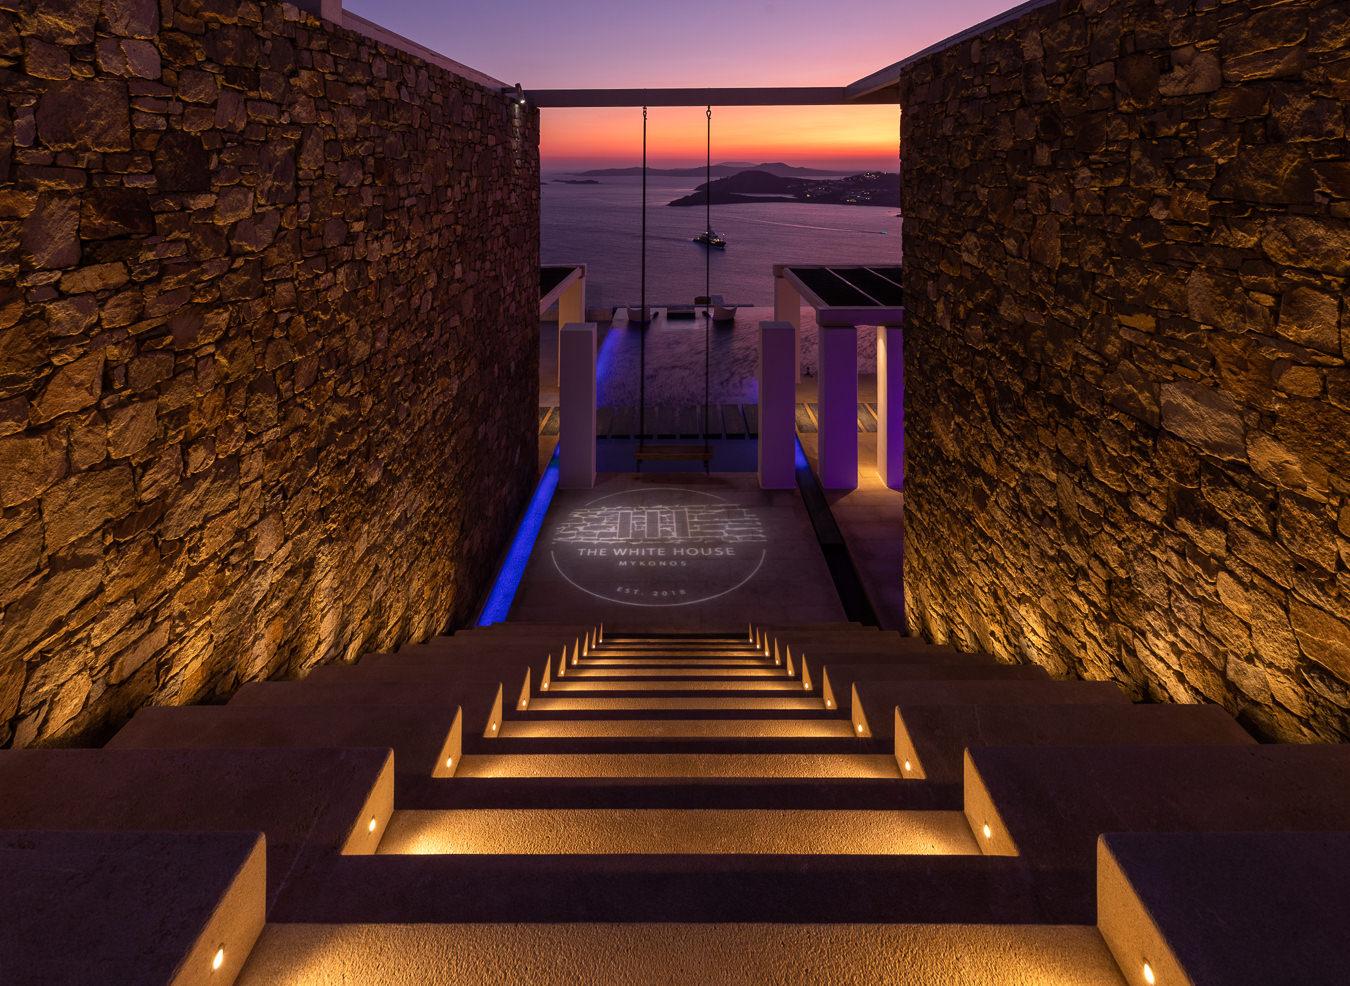 White House, Mykonos, Γιώργος Φάκαρος - Αρχιτεκτονική Φωτογραφία | Εσωτερικοί Χώροι | Φωτογραφία Ξενοδοχειών - Photography / Φωτογραφία